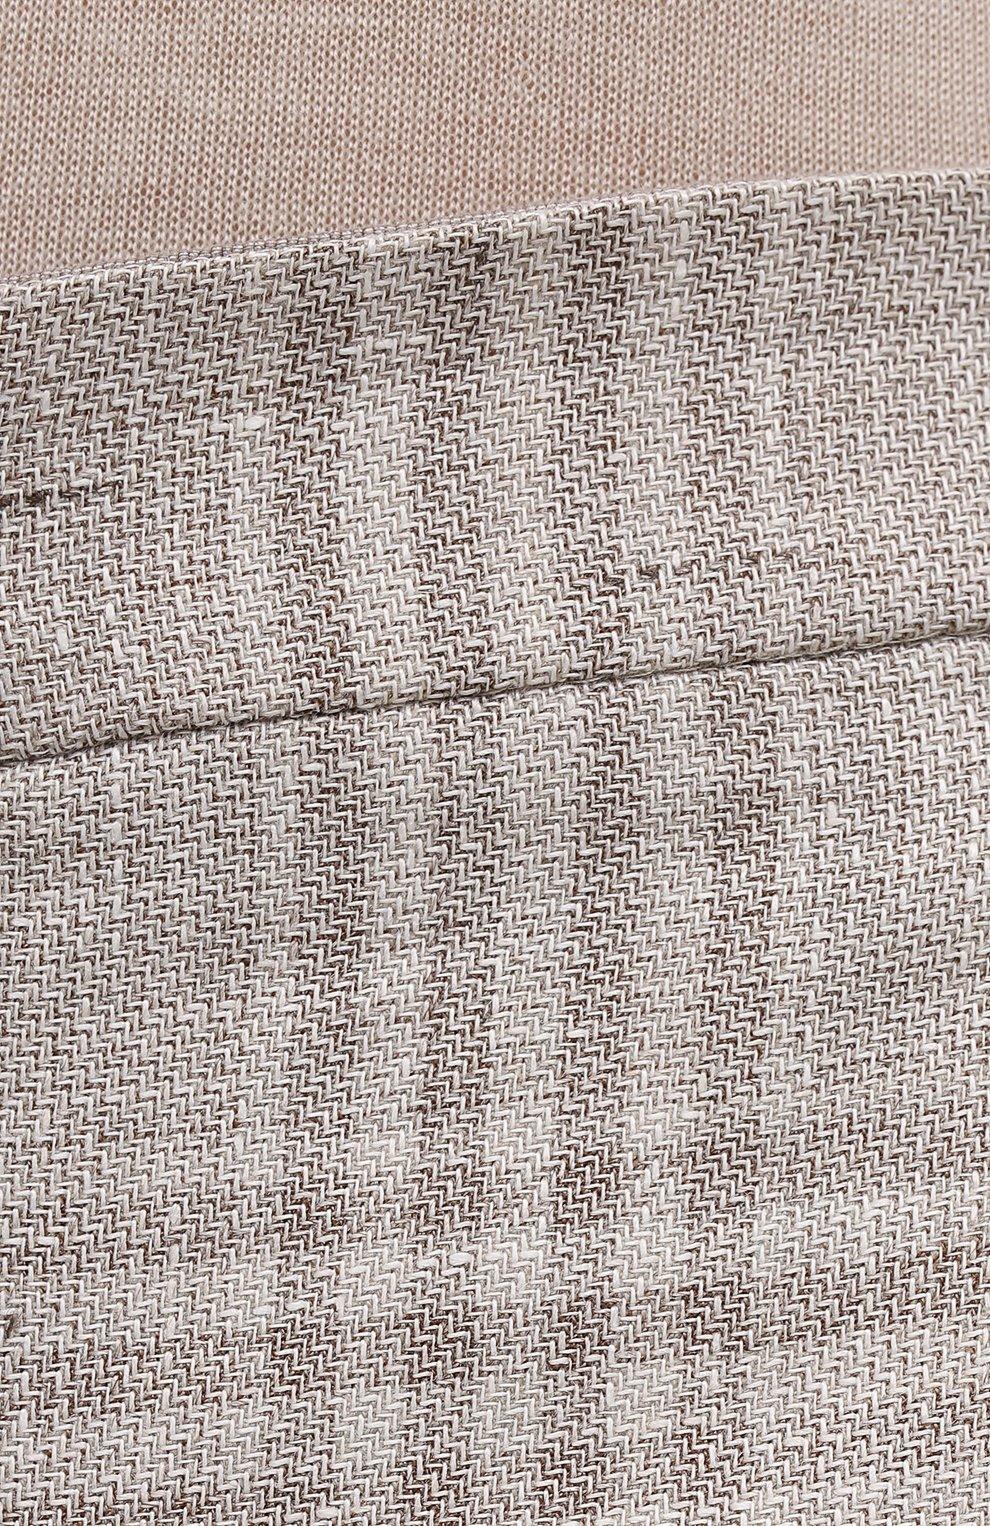 Женские брюки из льна и шерсти EMPORIO ARMANI бежевого цвета, арт. 0NP4CT/02167 | Фото 5